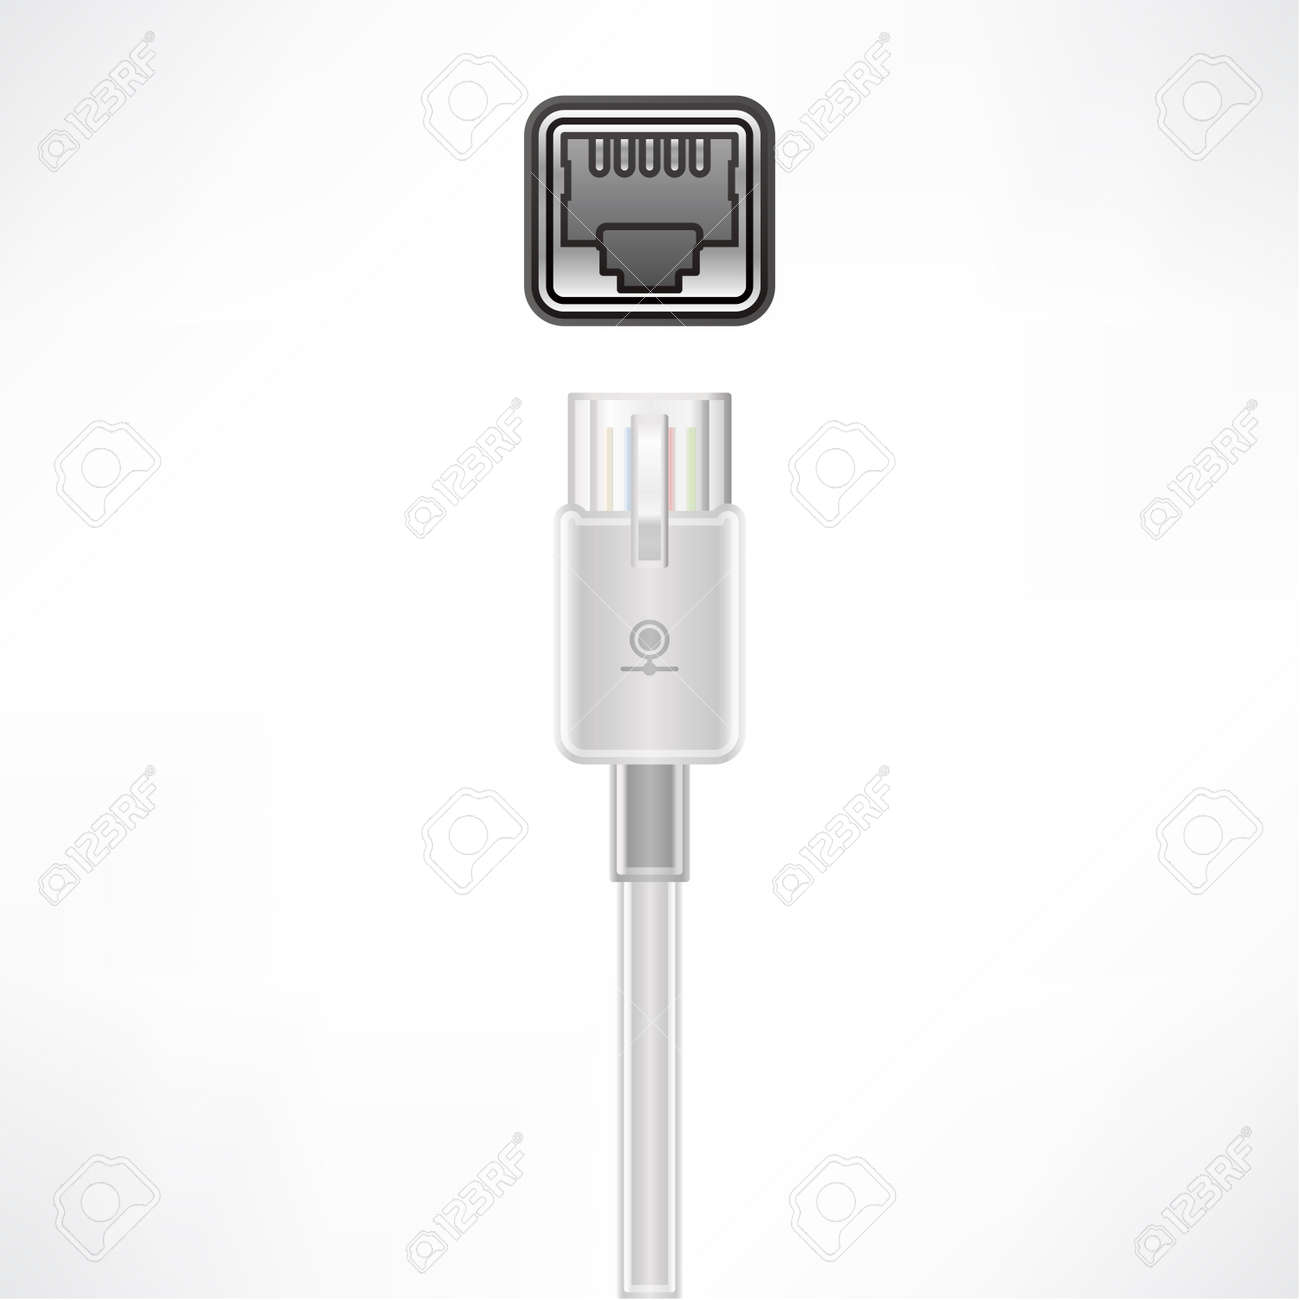 LAN plug socket Stock Vector - 10273179